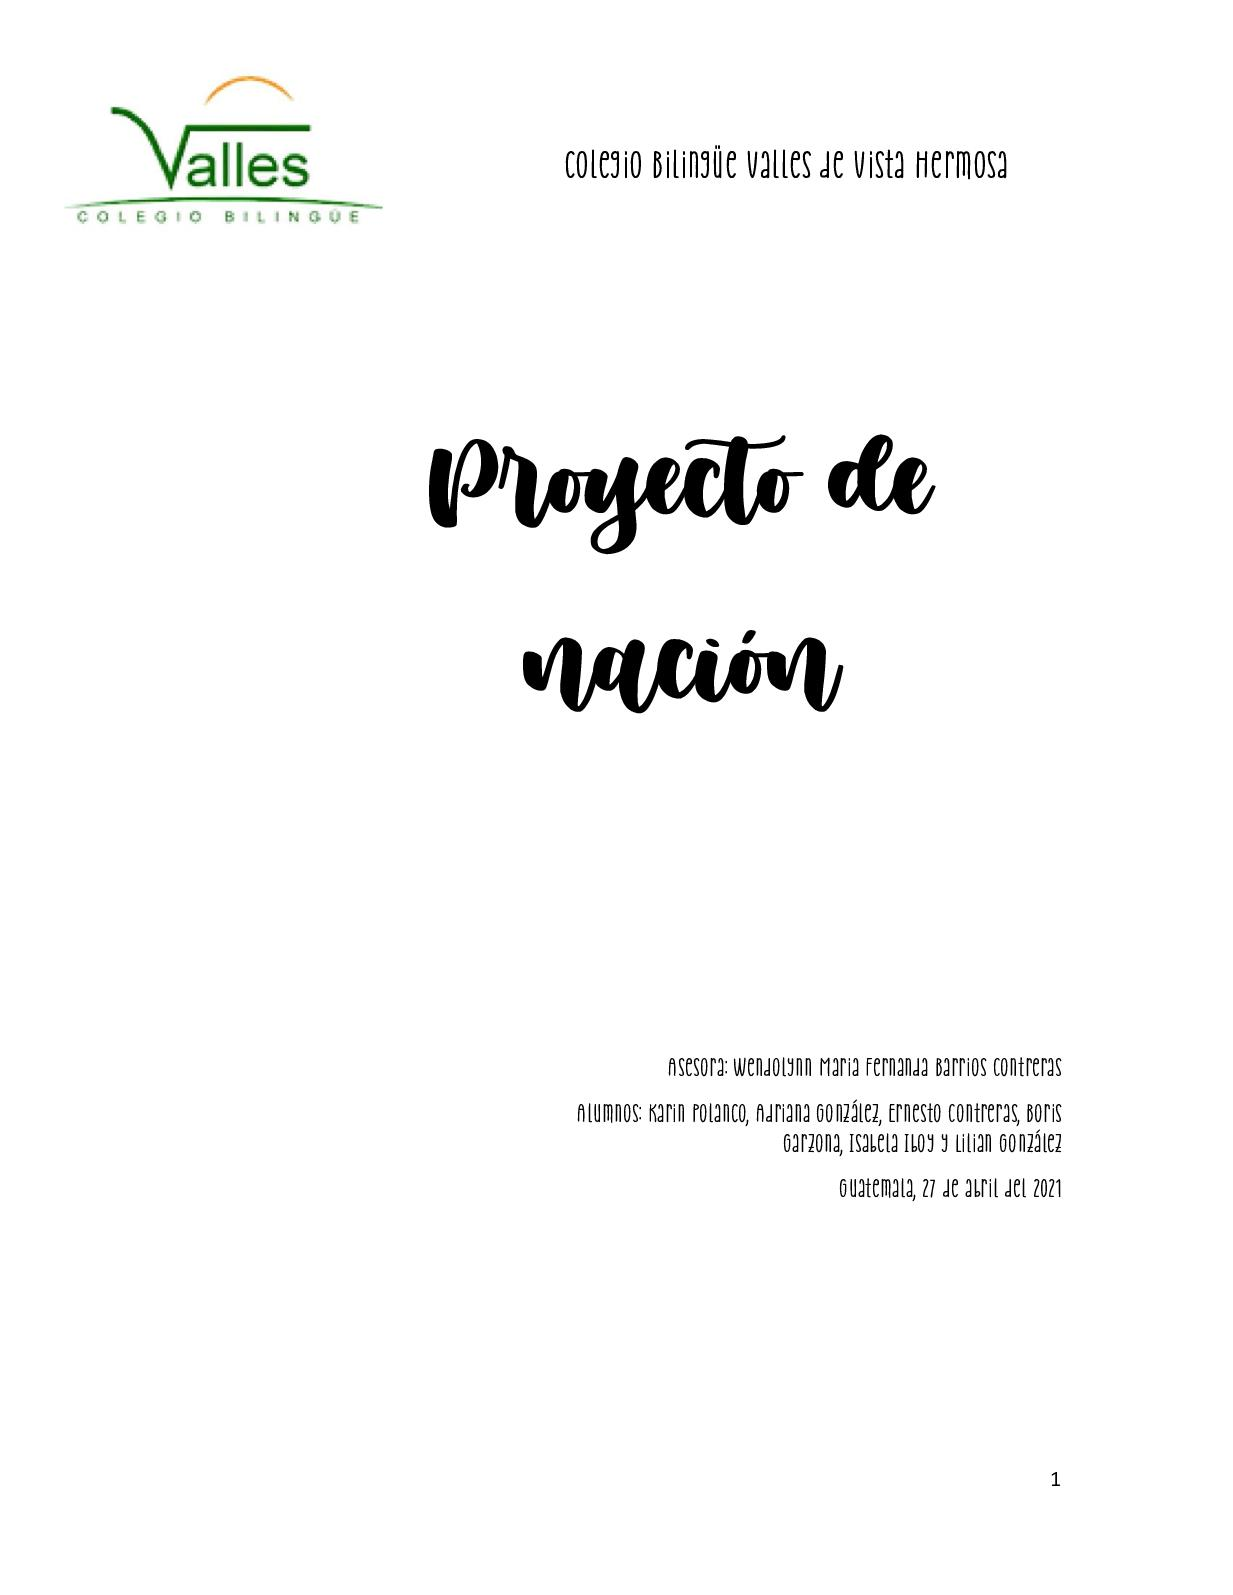 Proyecto De Nación 27 Abrilpdf